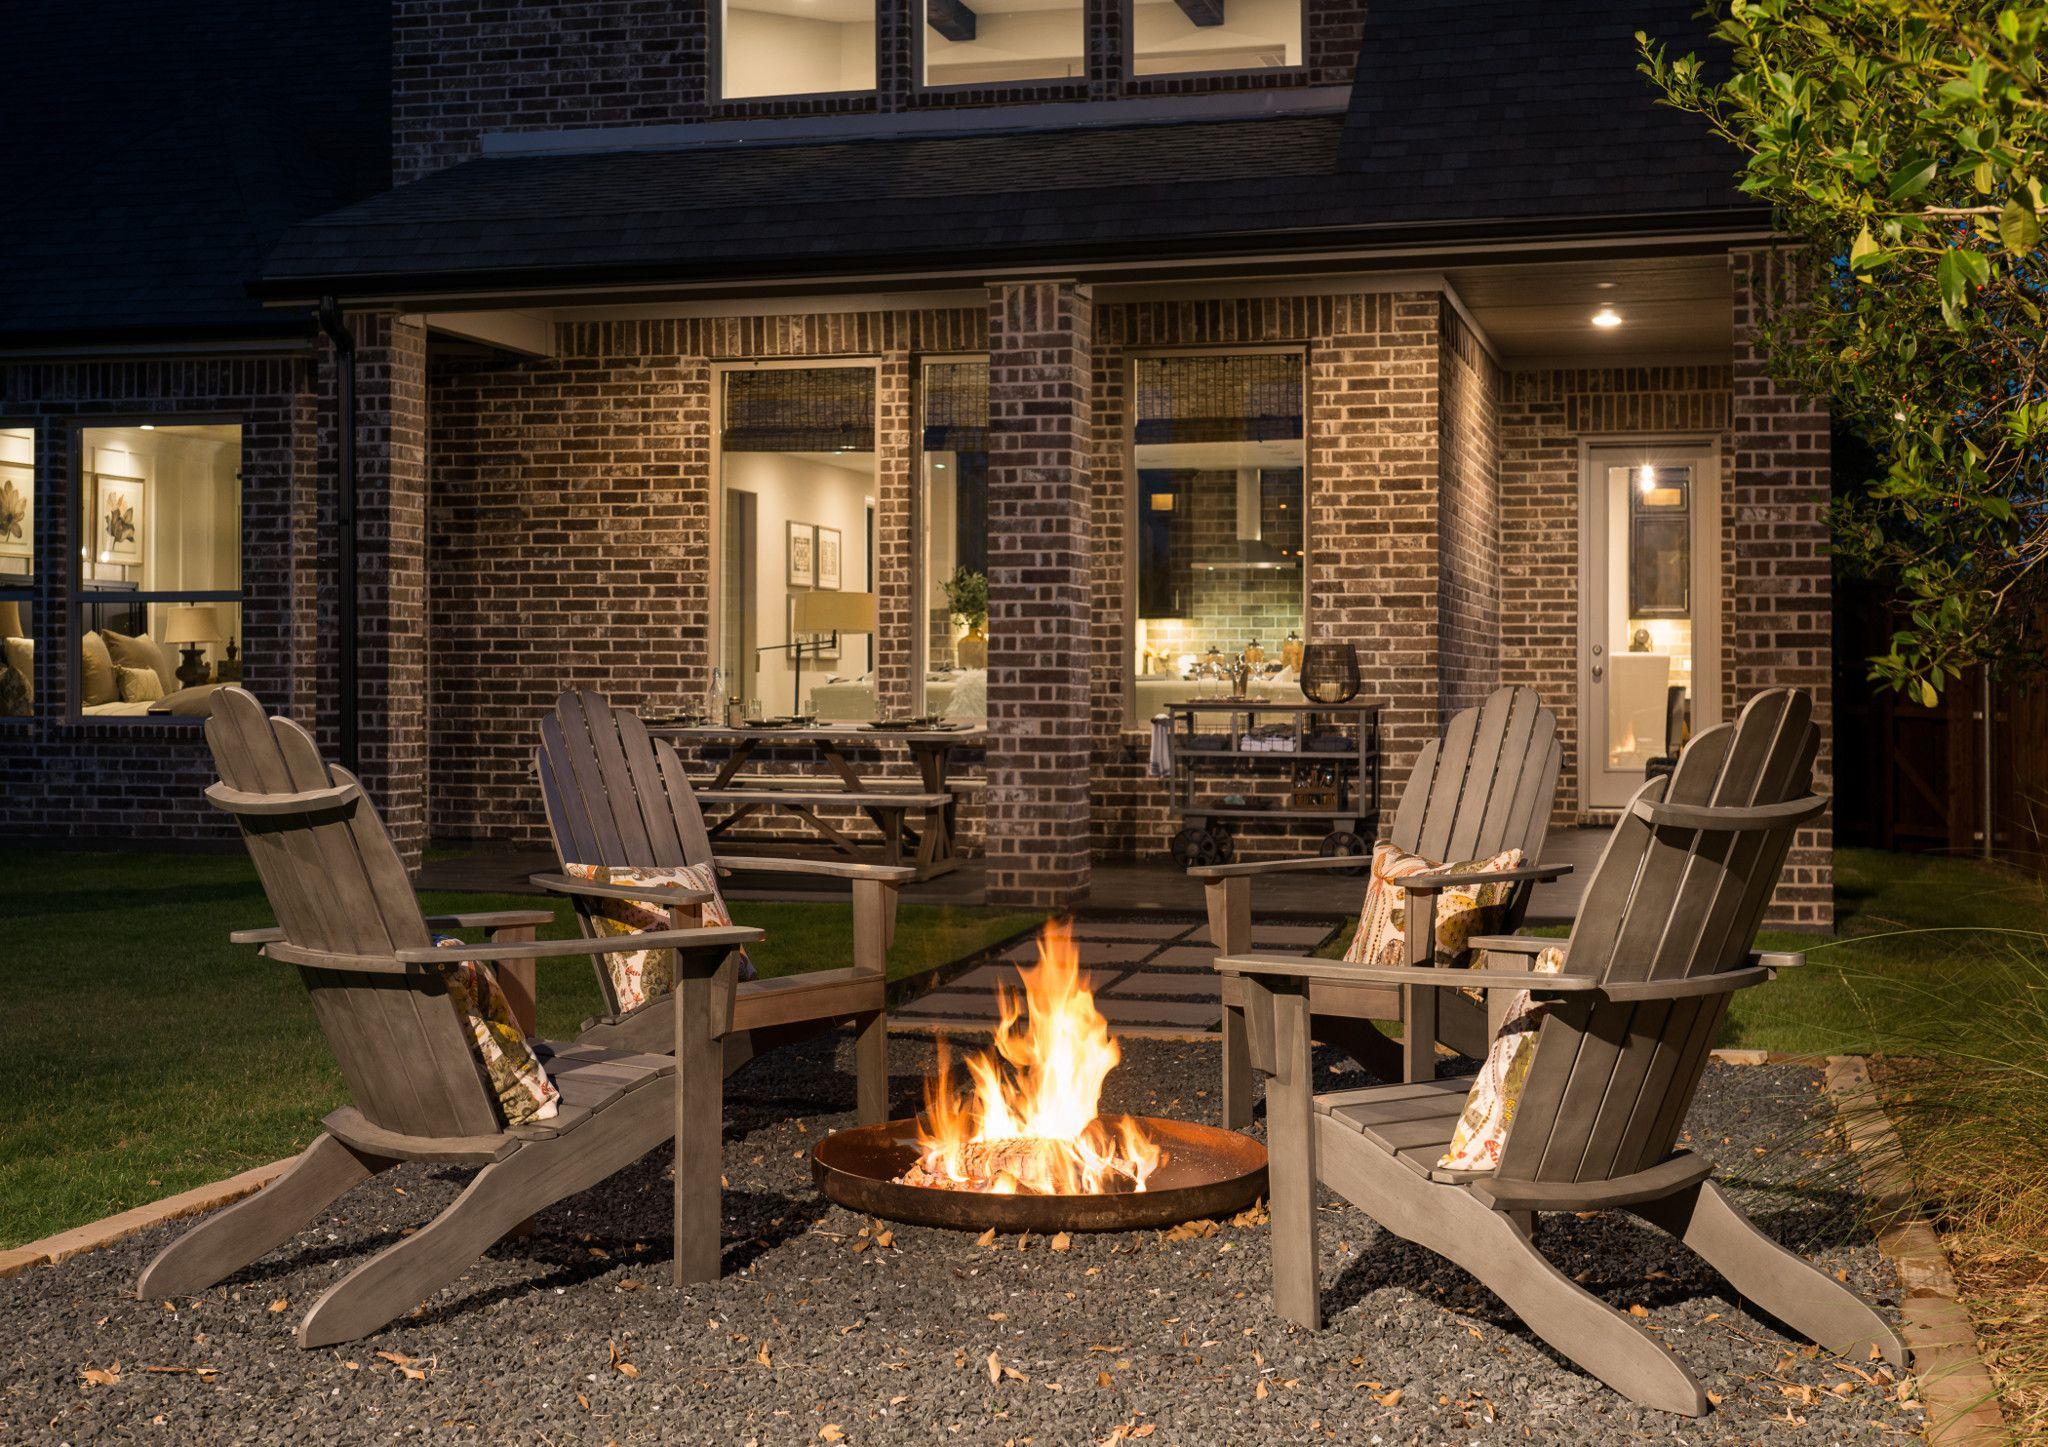 Canyon falls indoor fireplace backyard indoor outdoor